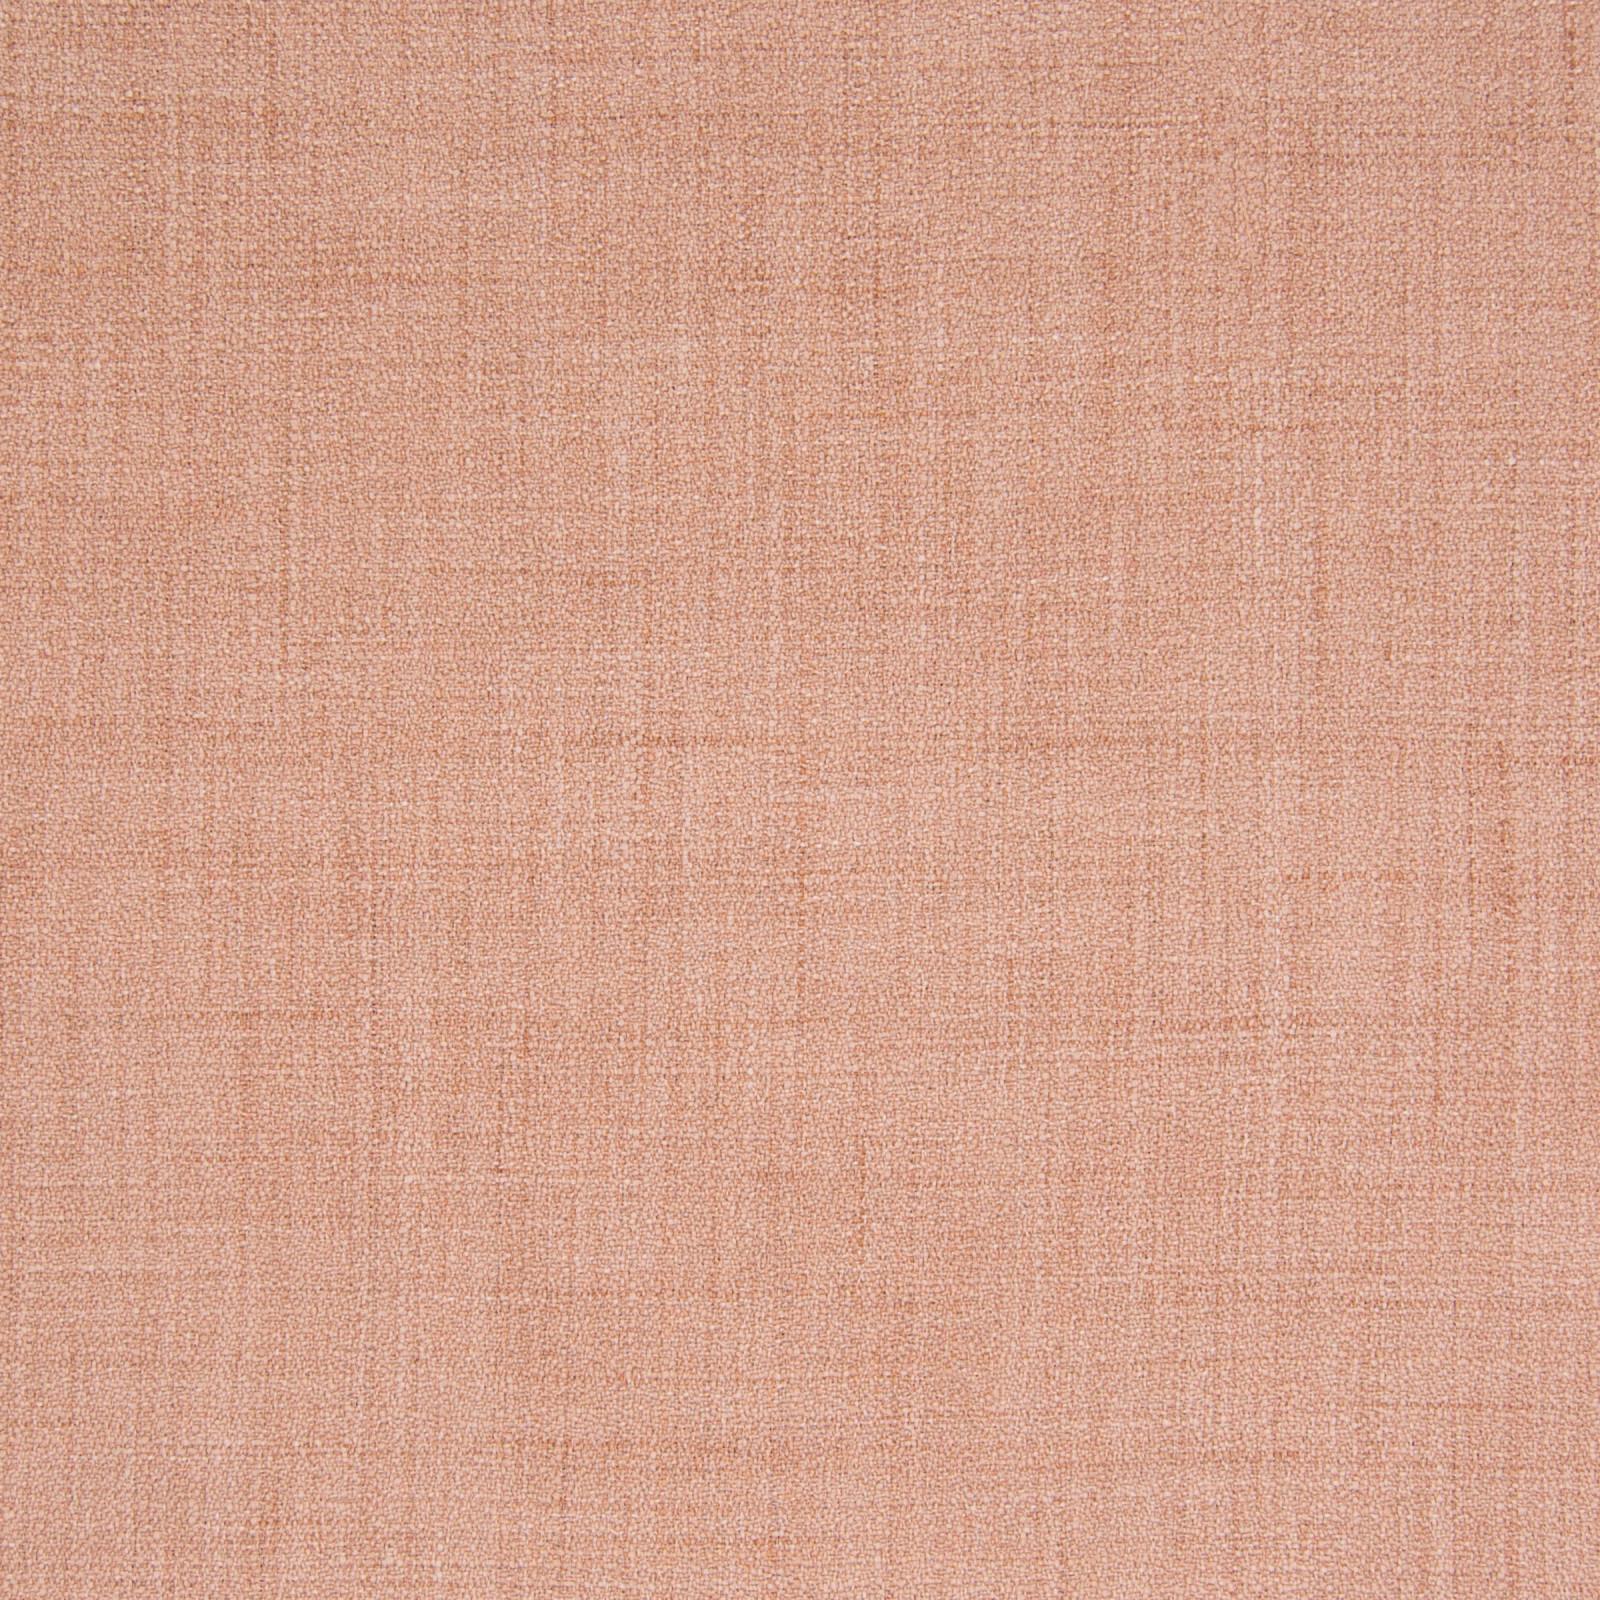 B8244 Nude Greenhouse Fabrics